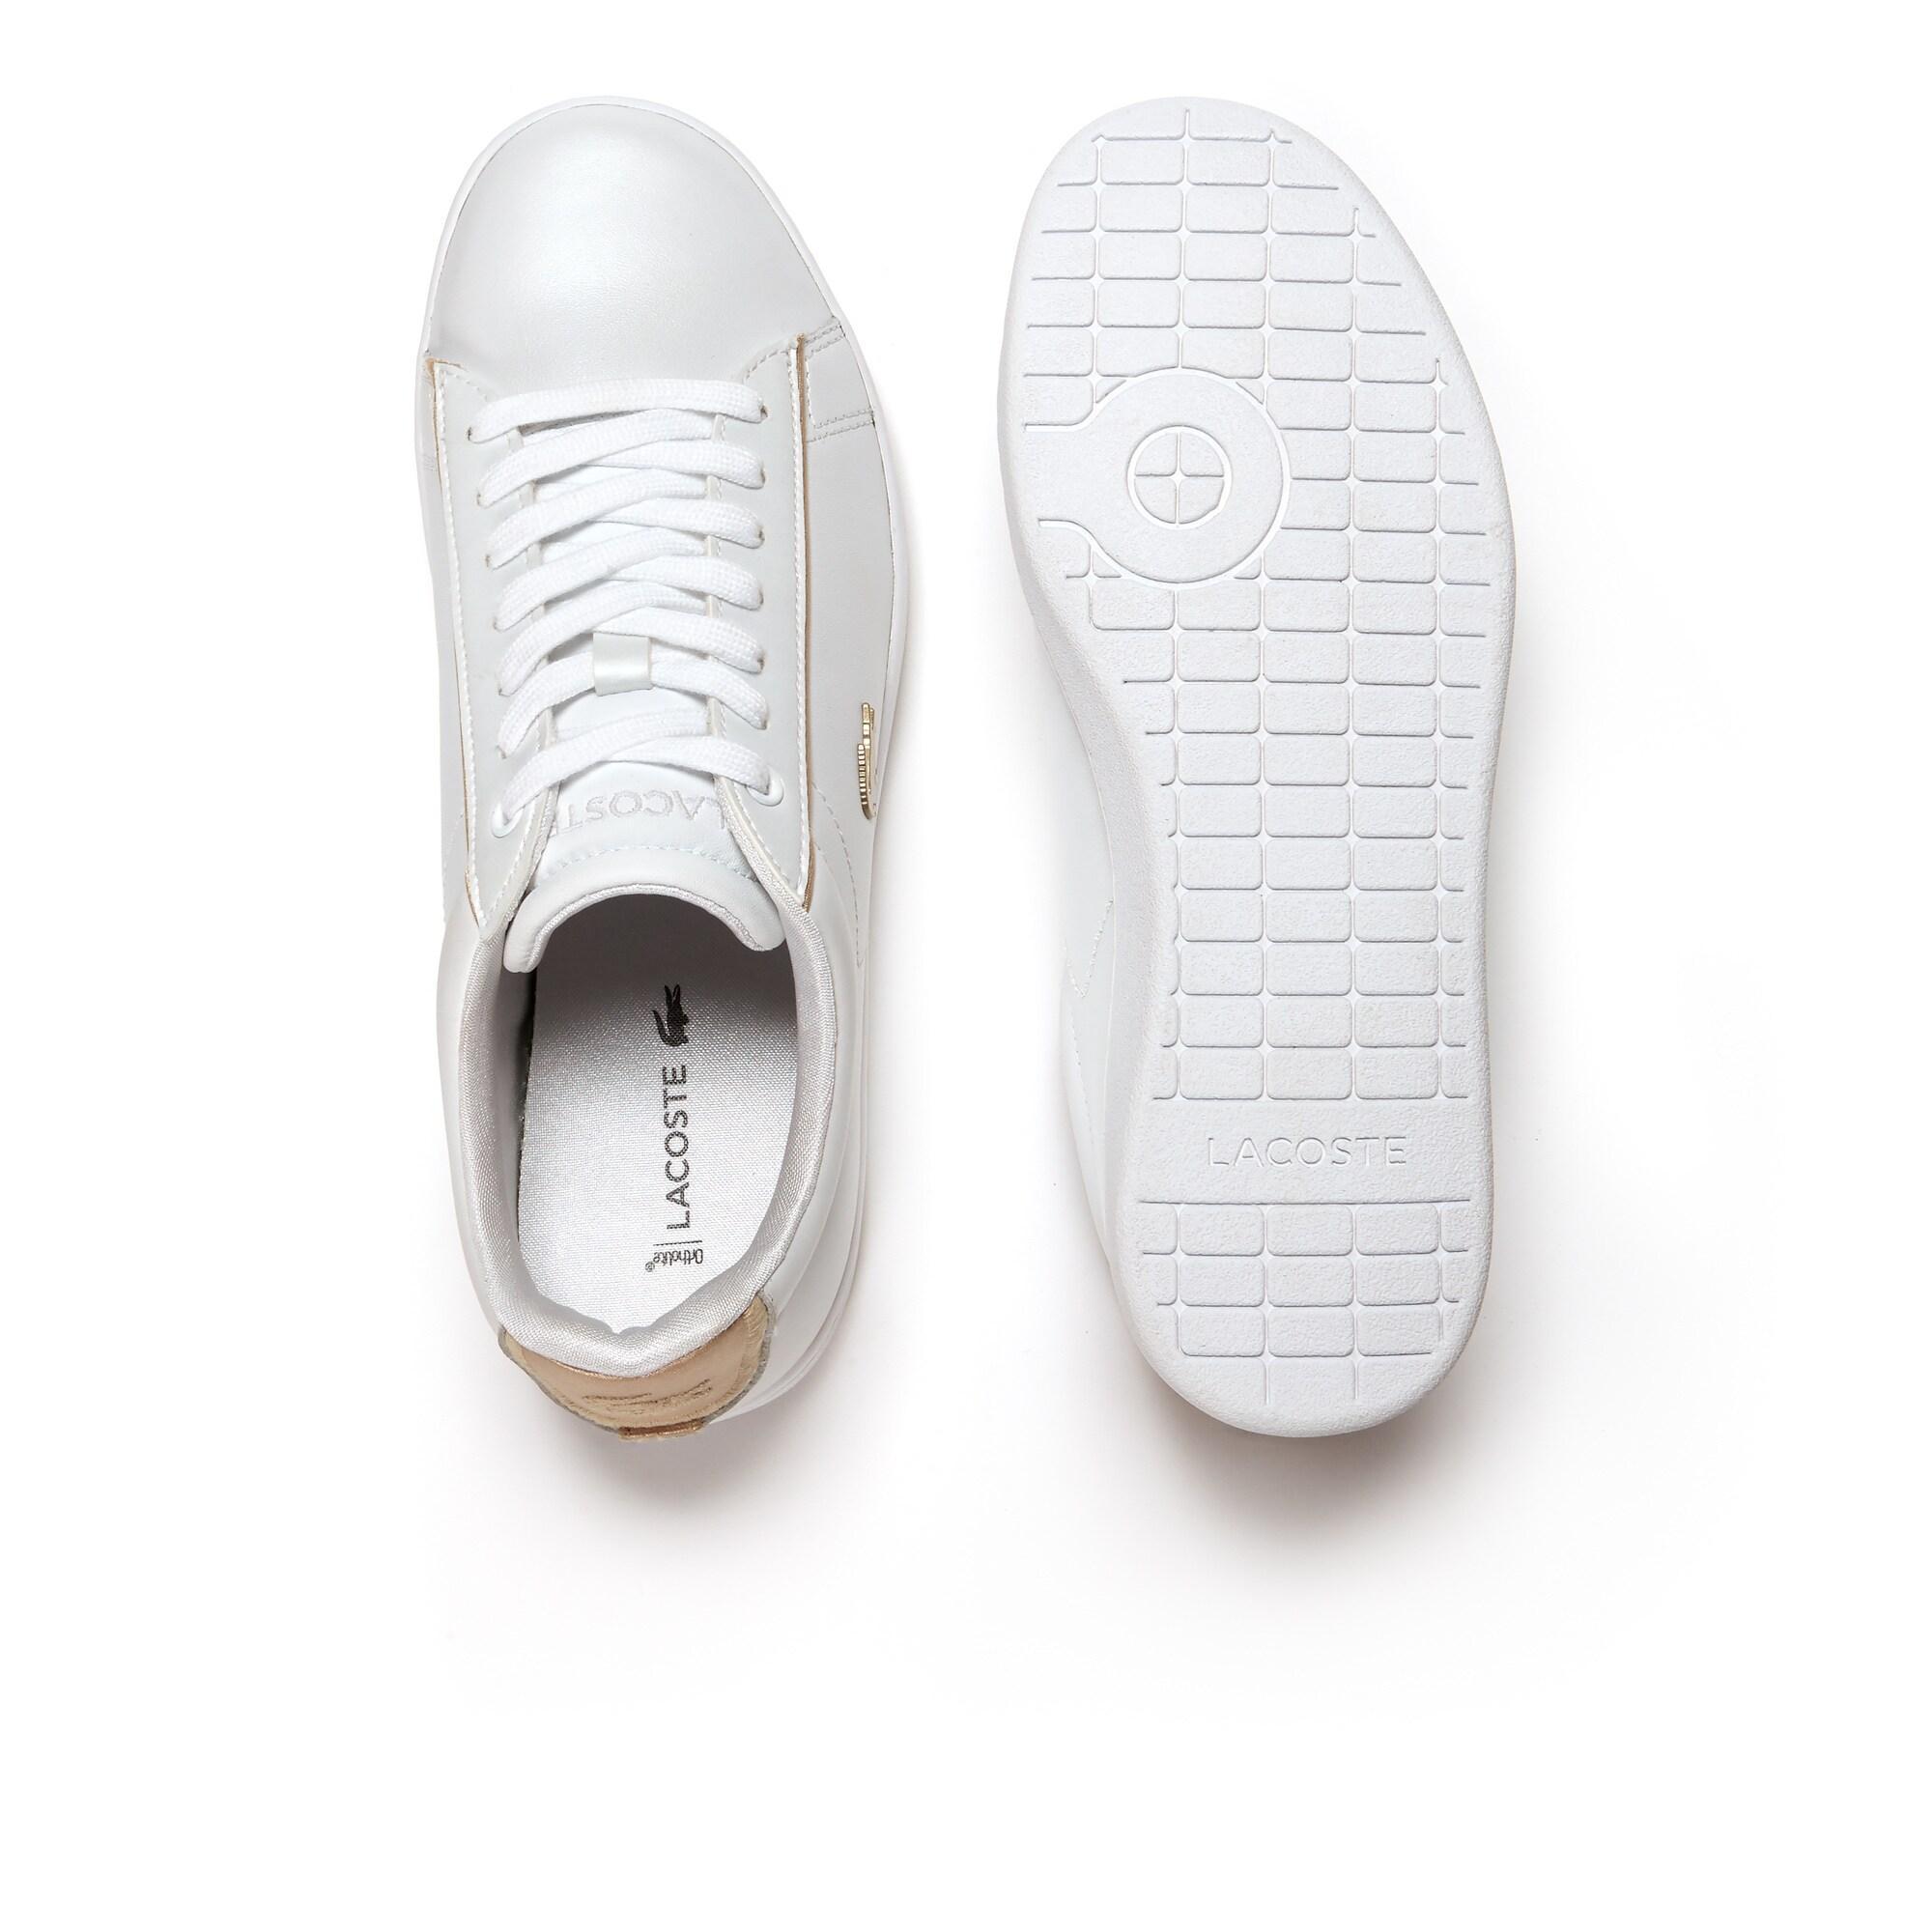 Lacoste Carnaby Evo 118 6 Damskie Skórzane Sneakersy